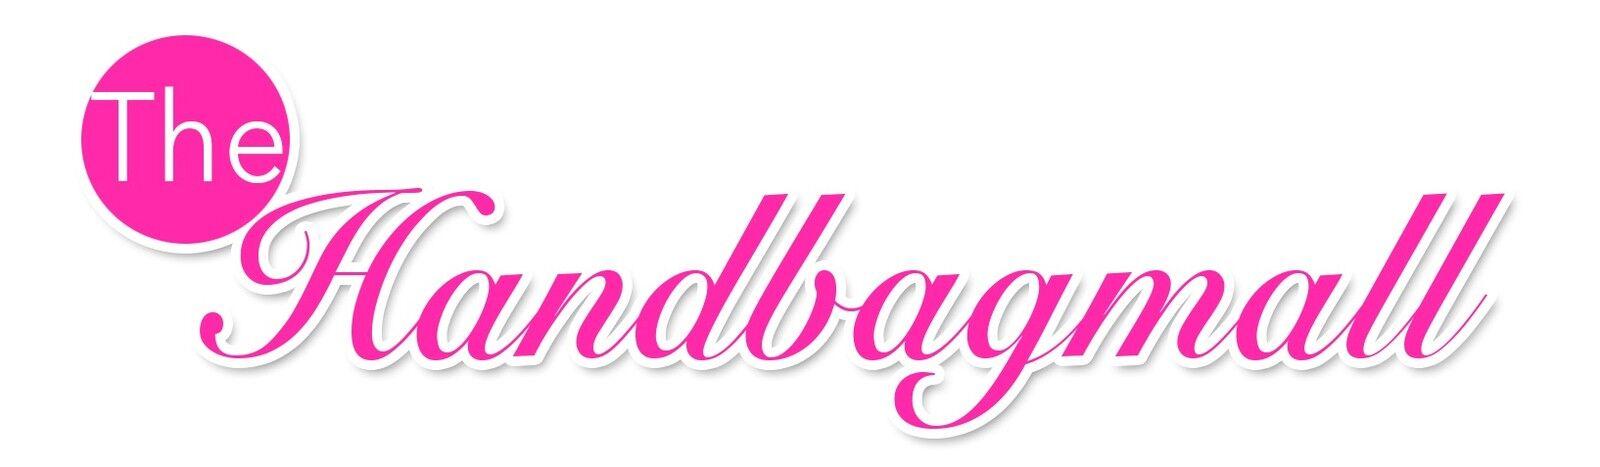 Michael Kors Handbags and Purses